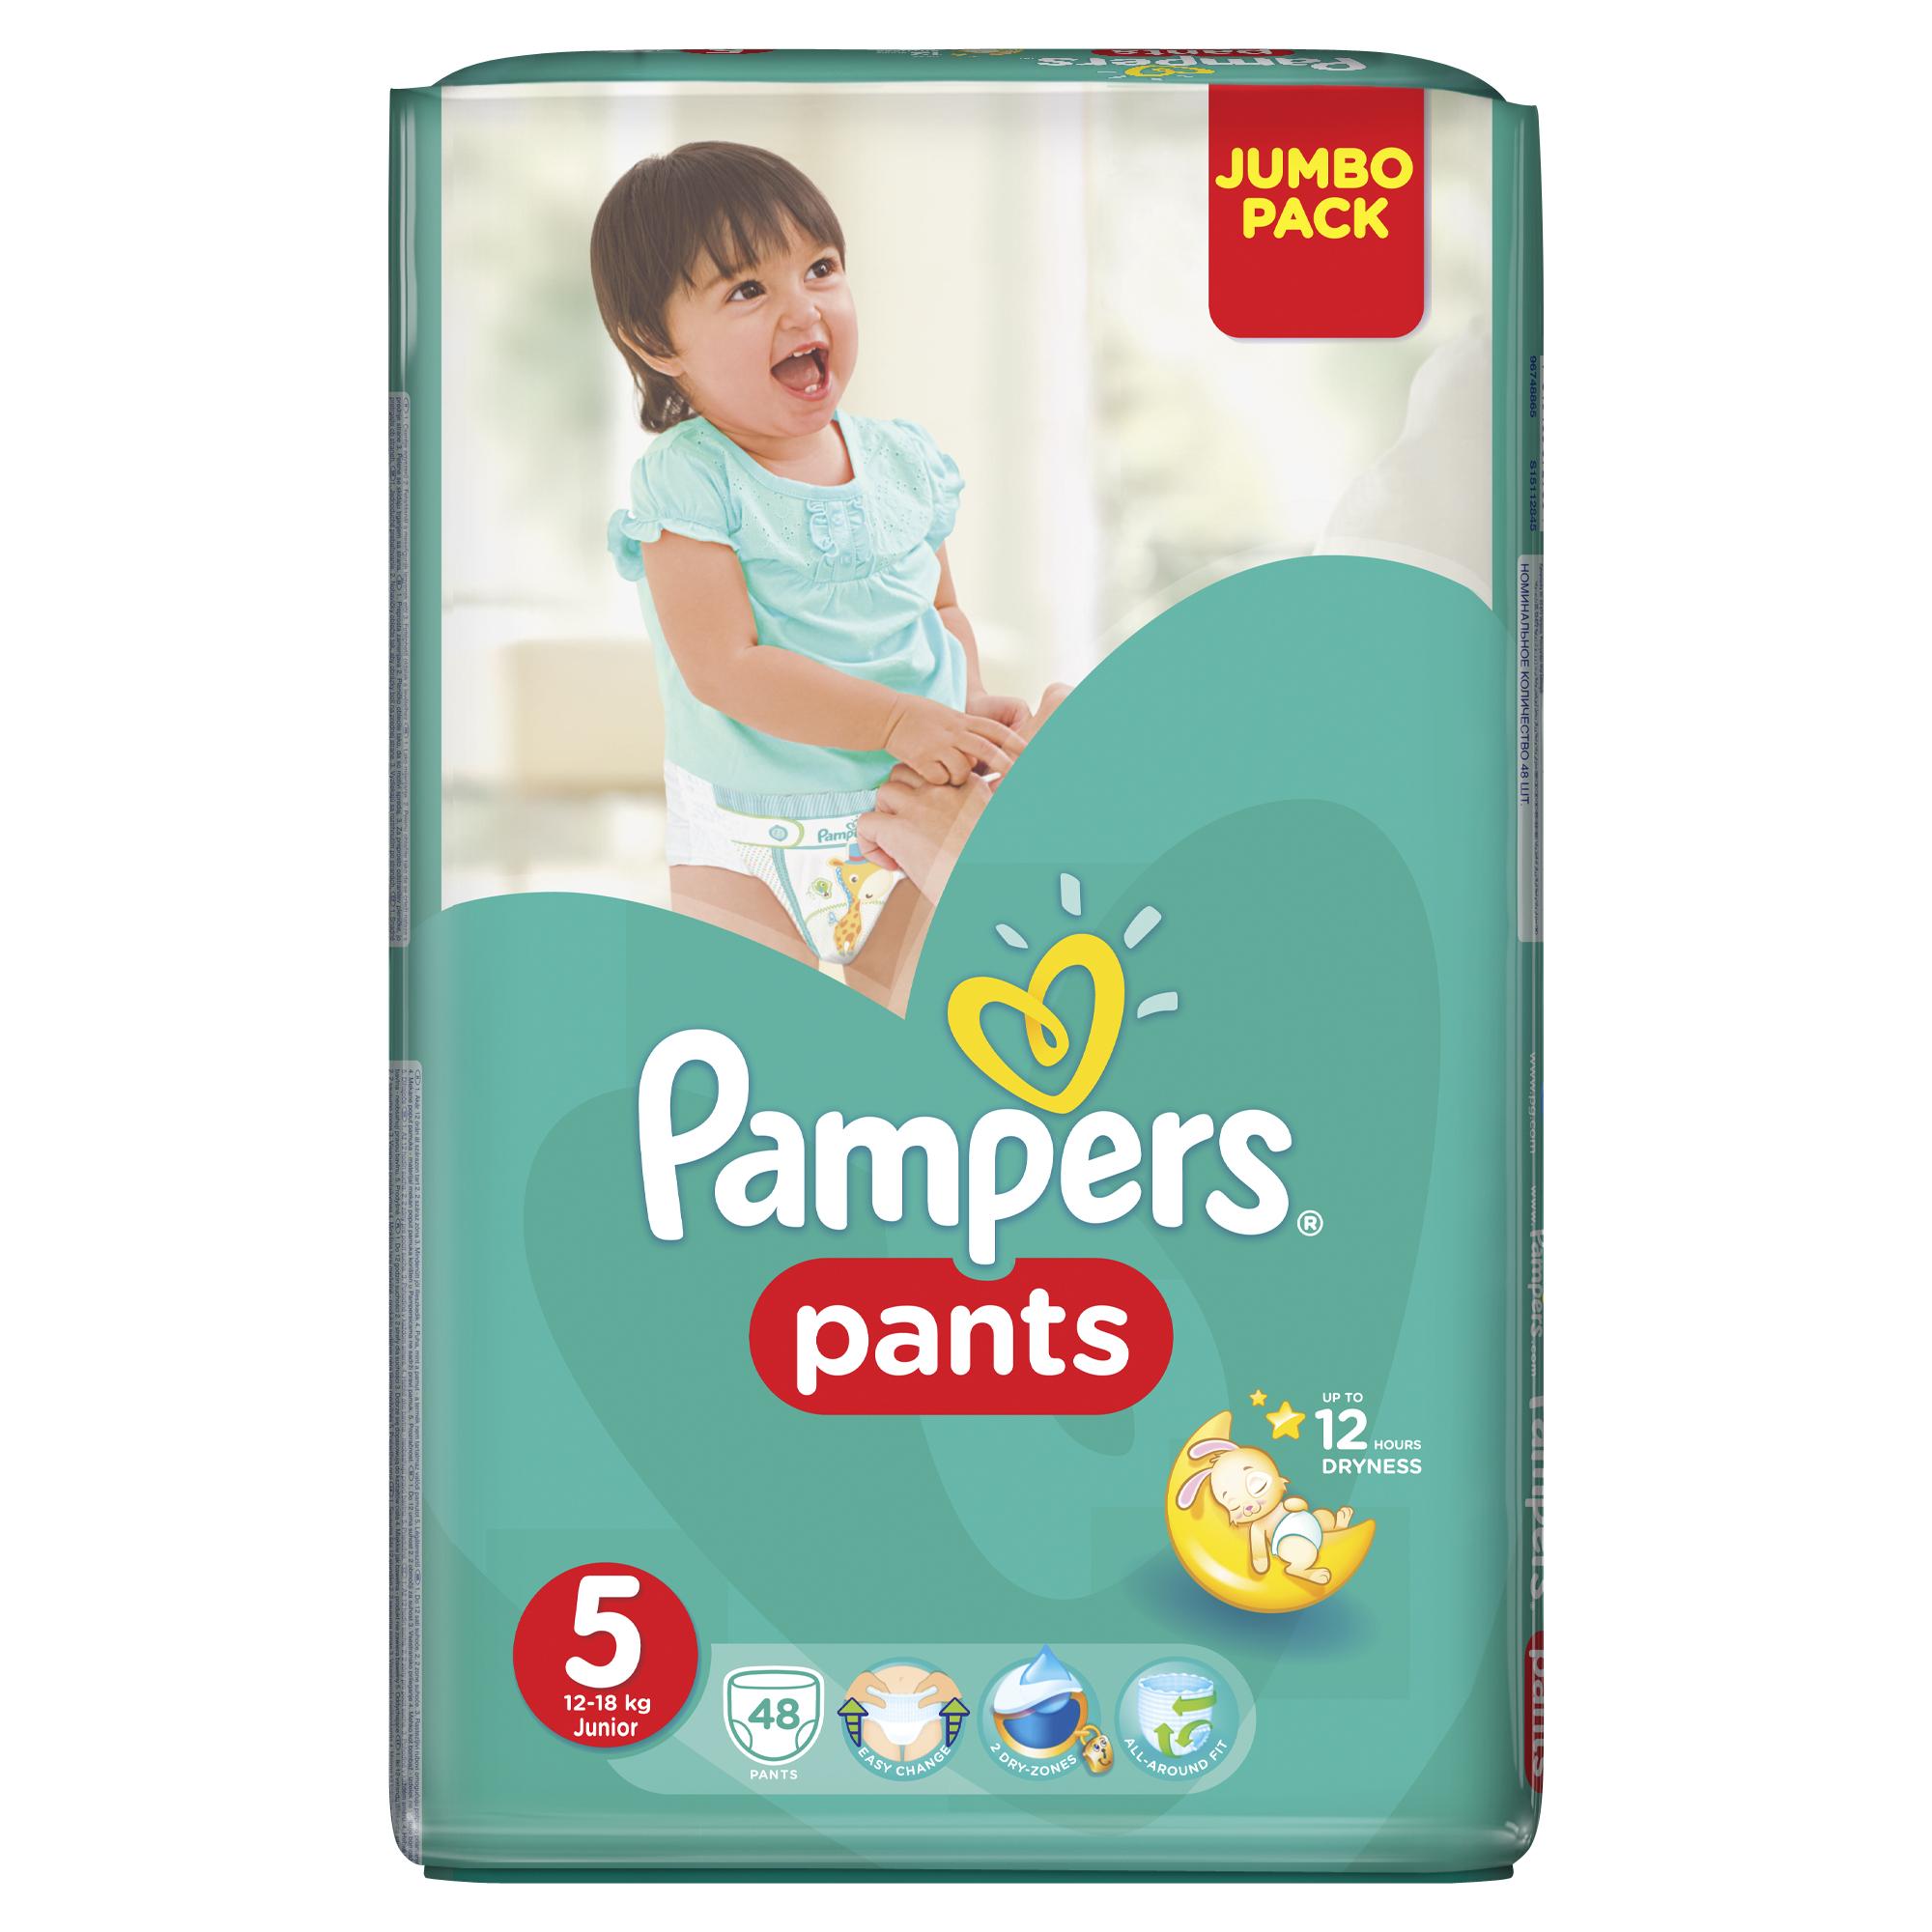 Sauskelnės PAMPERS Pants, JP, 5 dydis  12 - 18 kg, 48 vnt